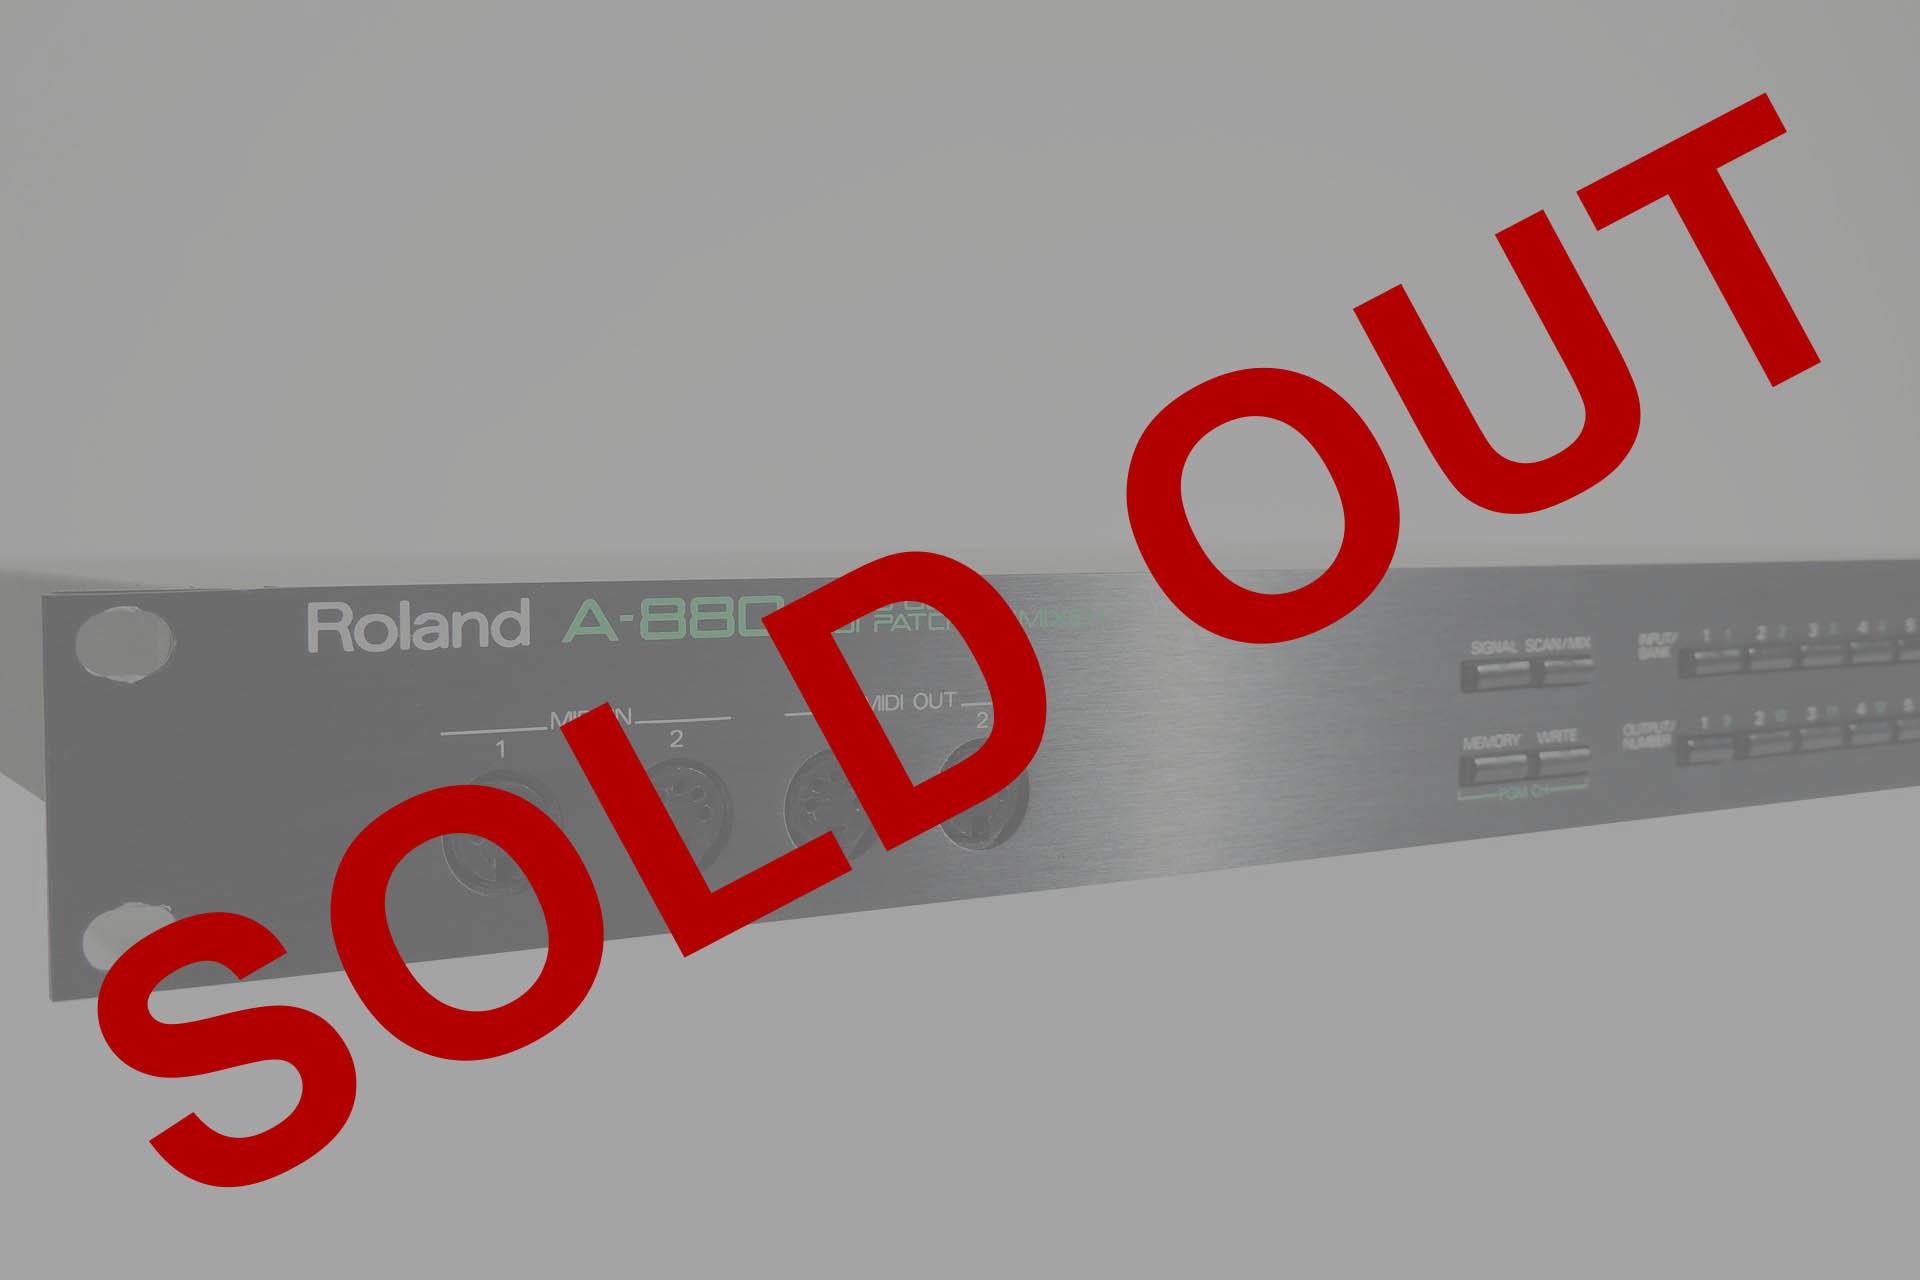 ROLAND A-880 8×8 MIDI PATCHBAY